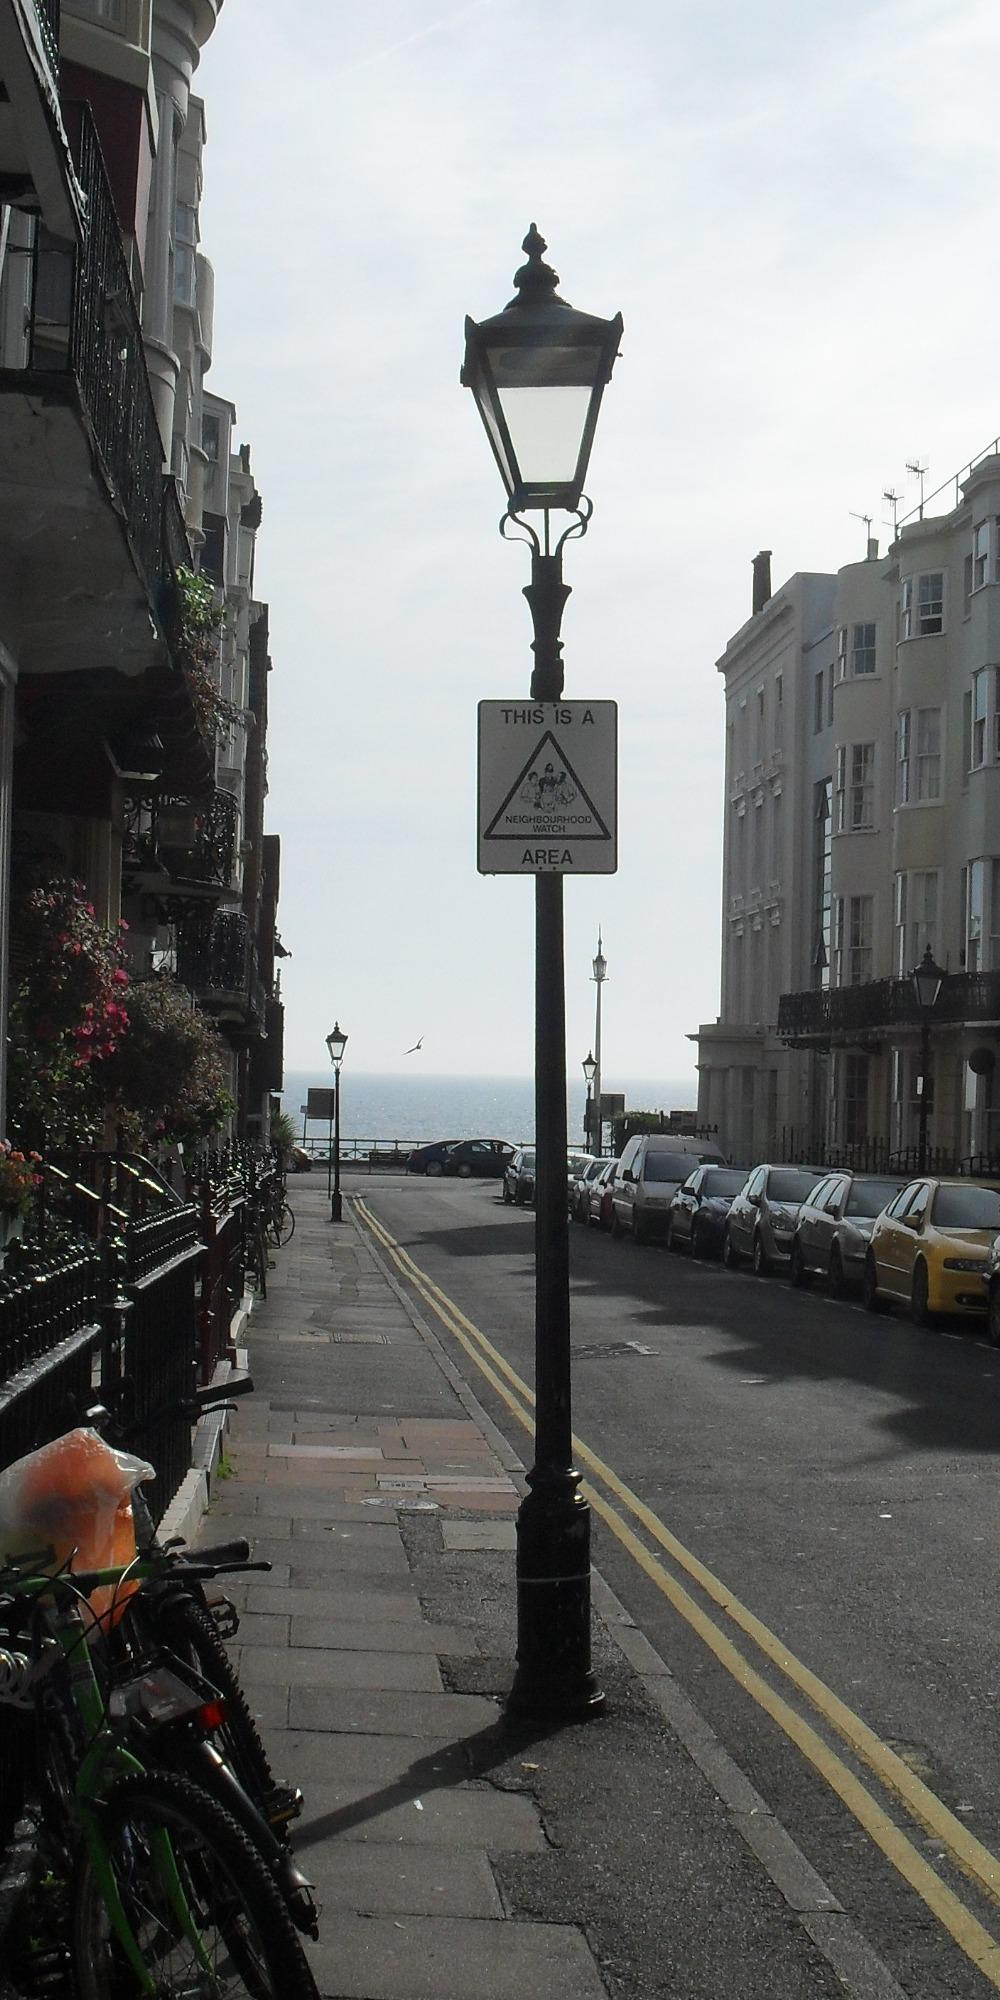 FileLamp Post At 16 And 17 Charlotte Street Brighton